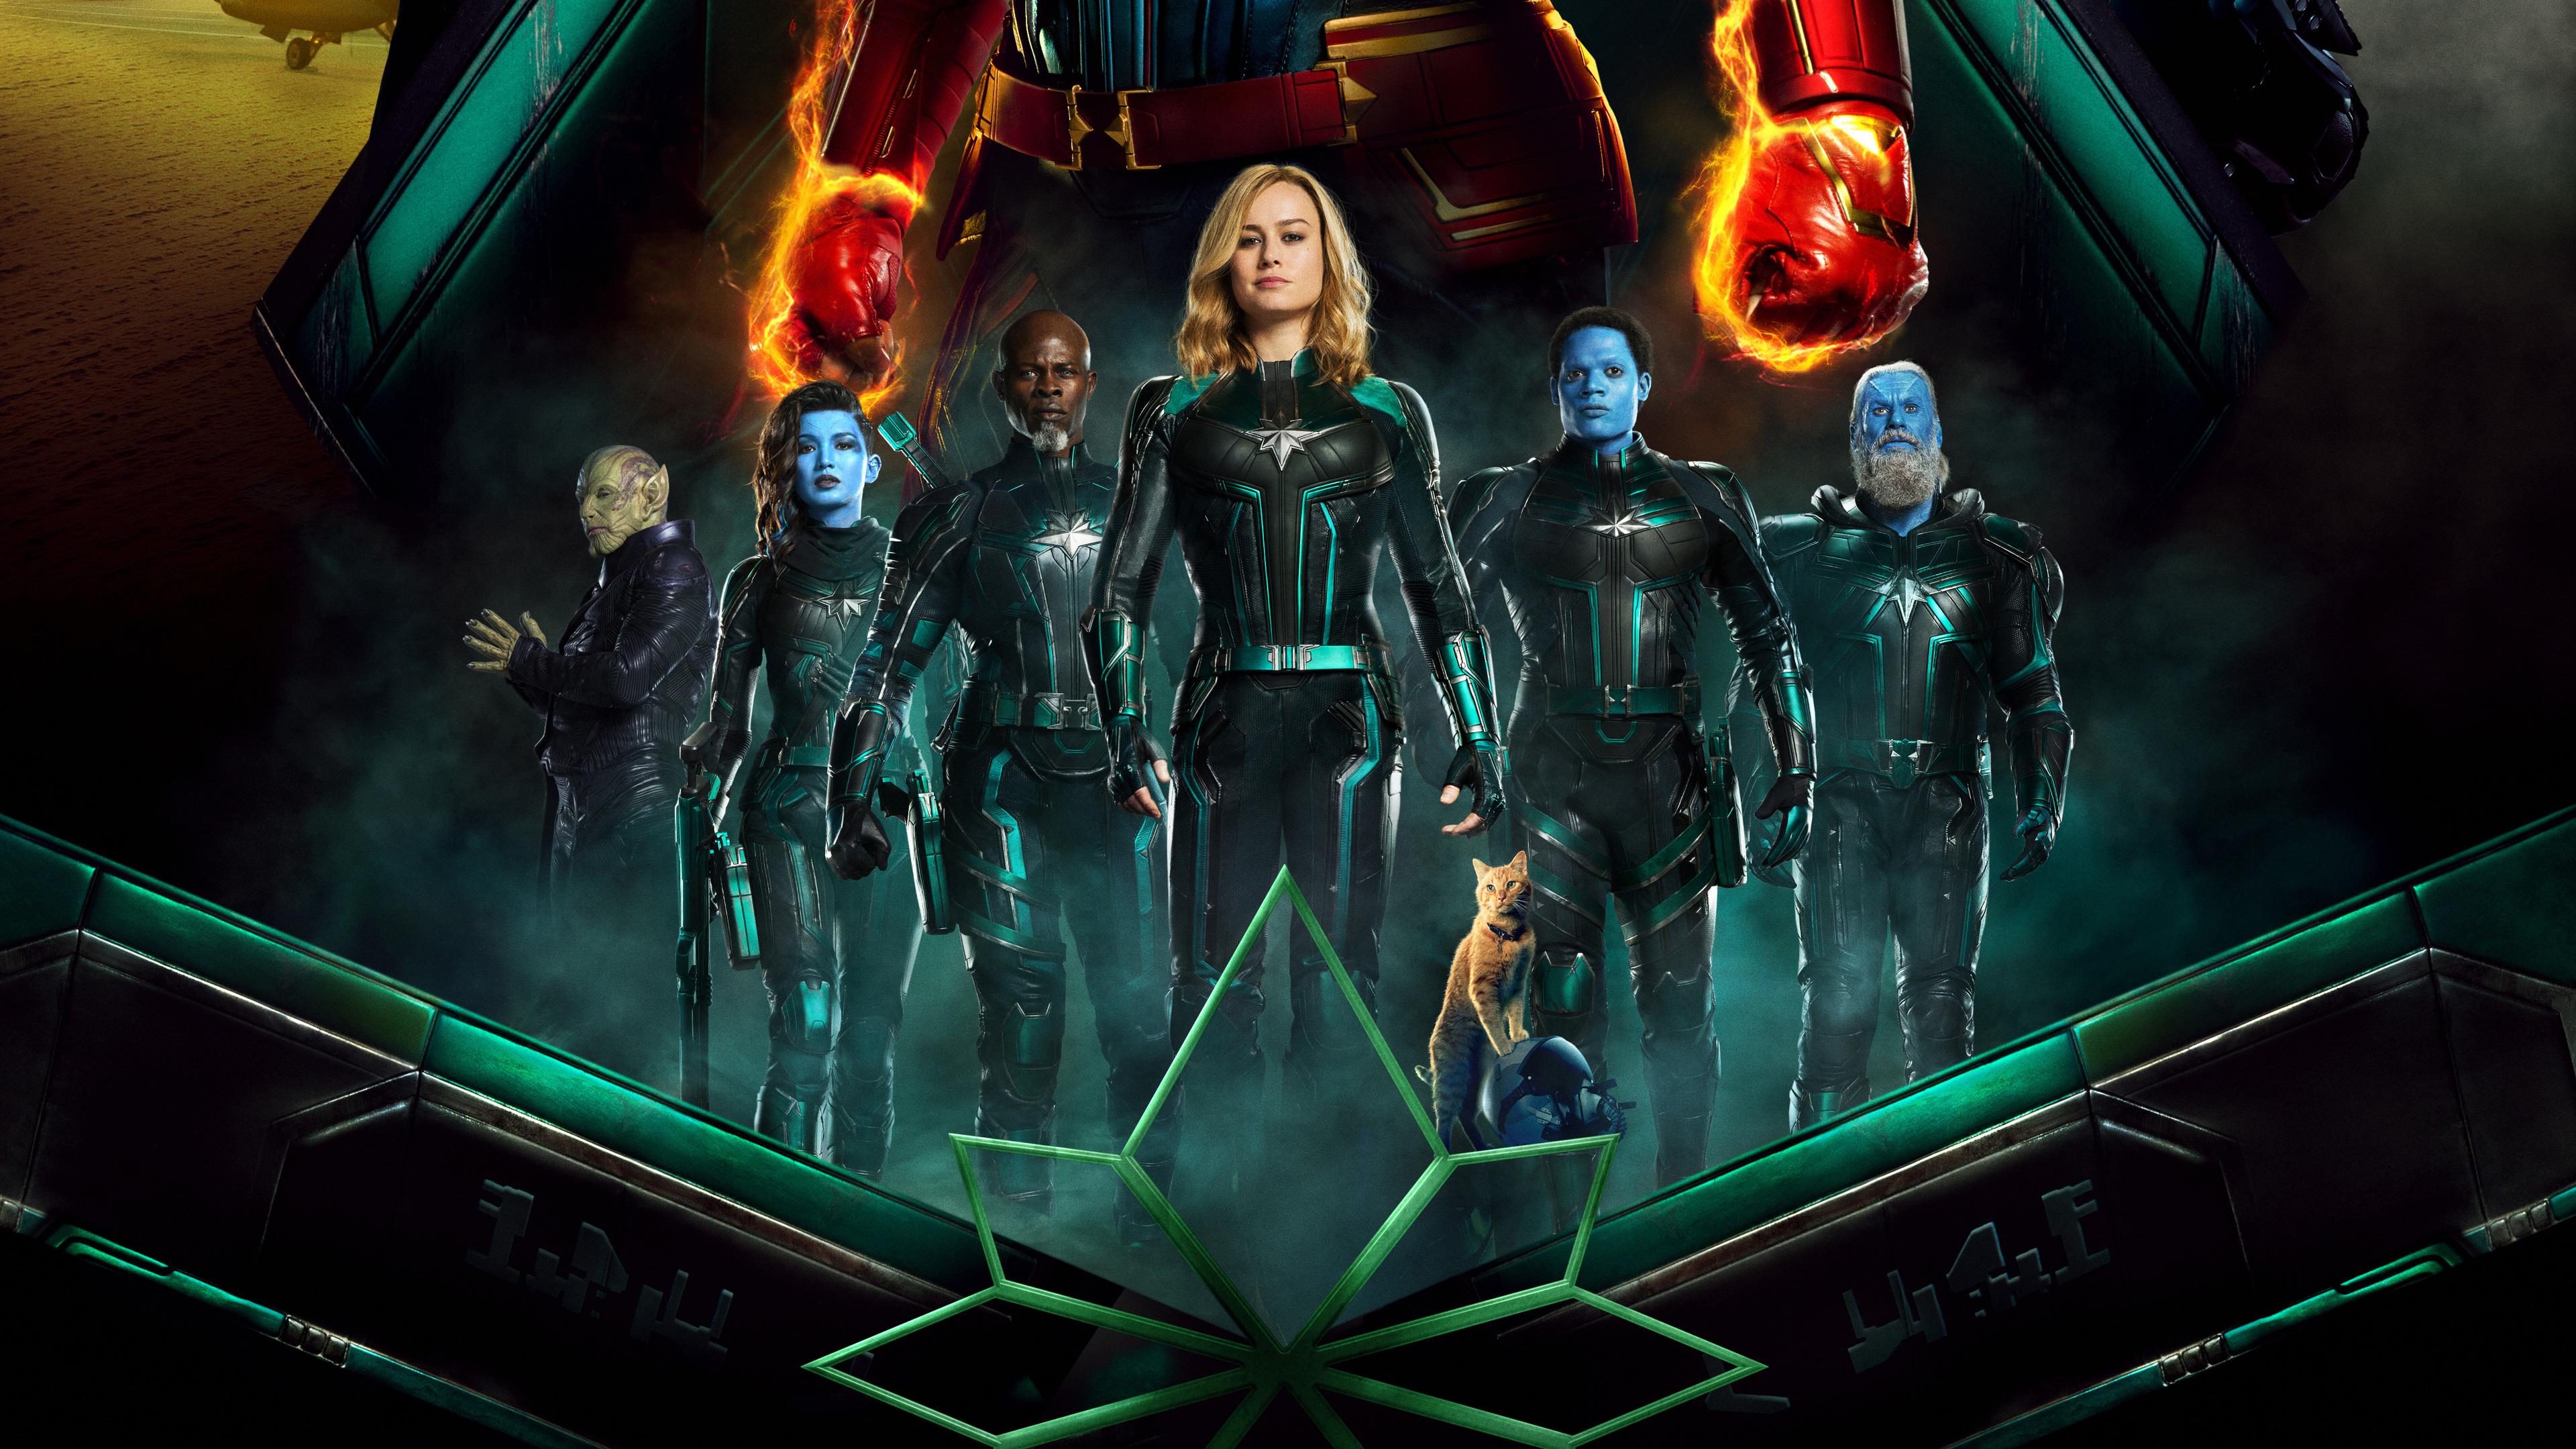 Wallpaper 4k Captain Marvel 4k New 2019 Movies Wallpapers 4k